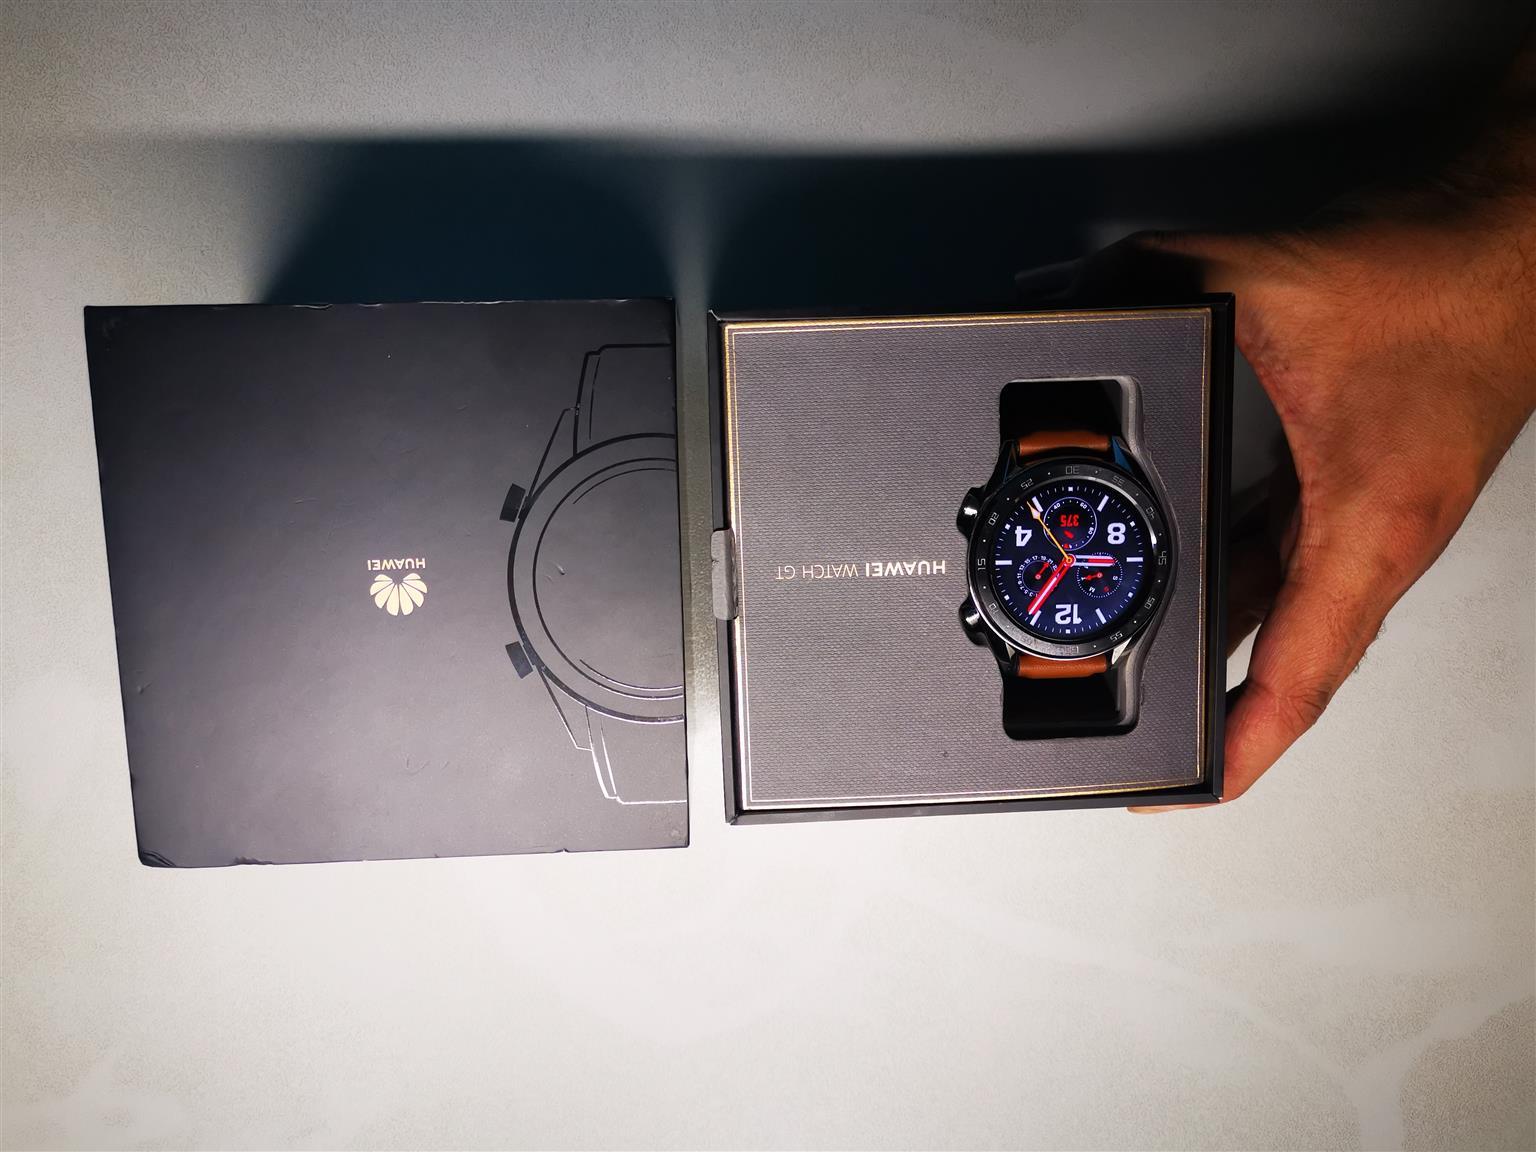 Samsung gear s3 frontier watch R4200 Huawei gt watch R4200